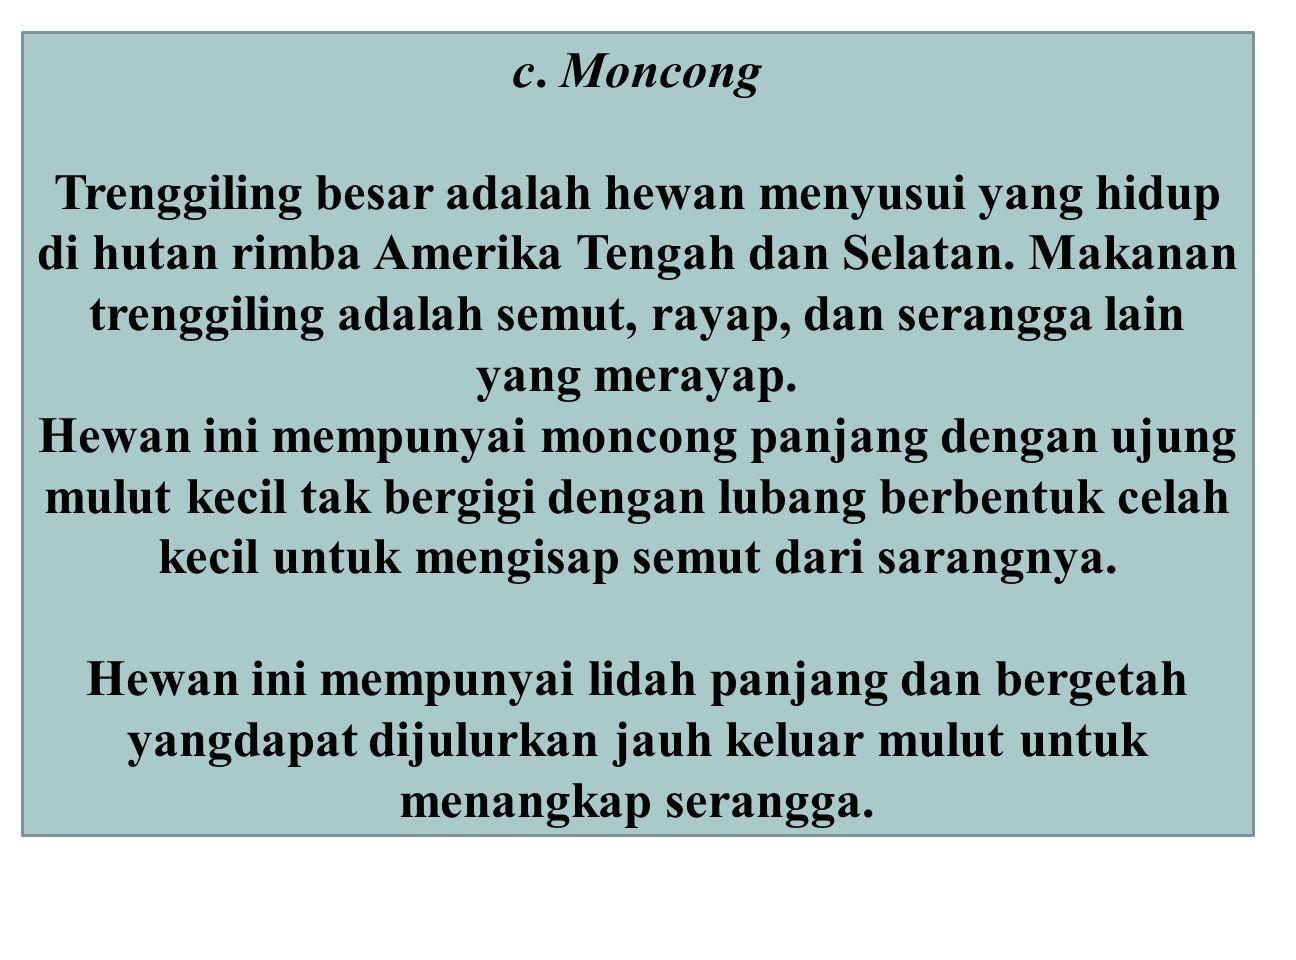 c. Moncong Trenggiling besar adalah hewan menyusui yang hidup di hutan rimba Amerika Tengah dan Selatan. Makanan trenggiling adalah semut, rayap, dan